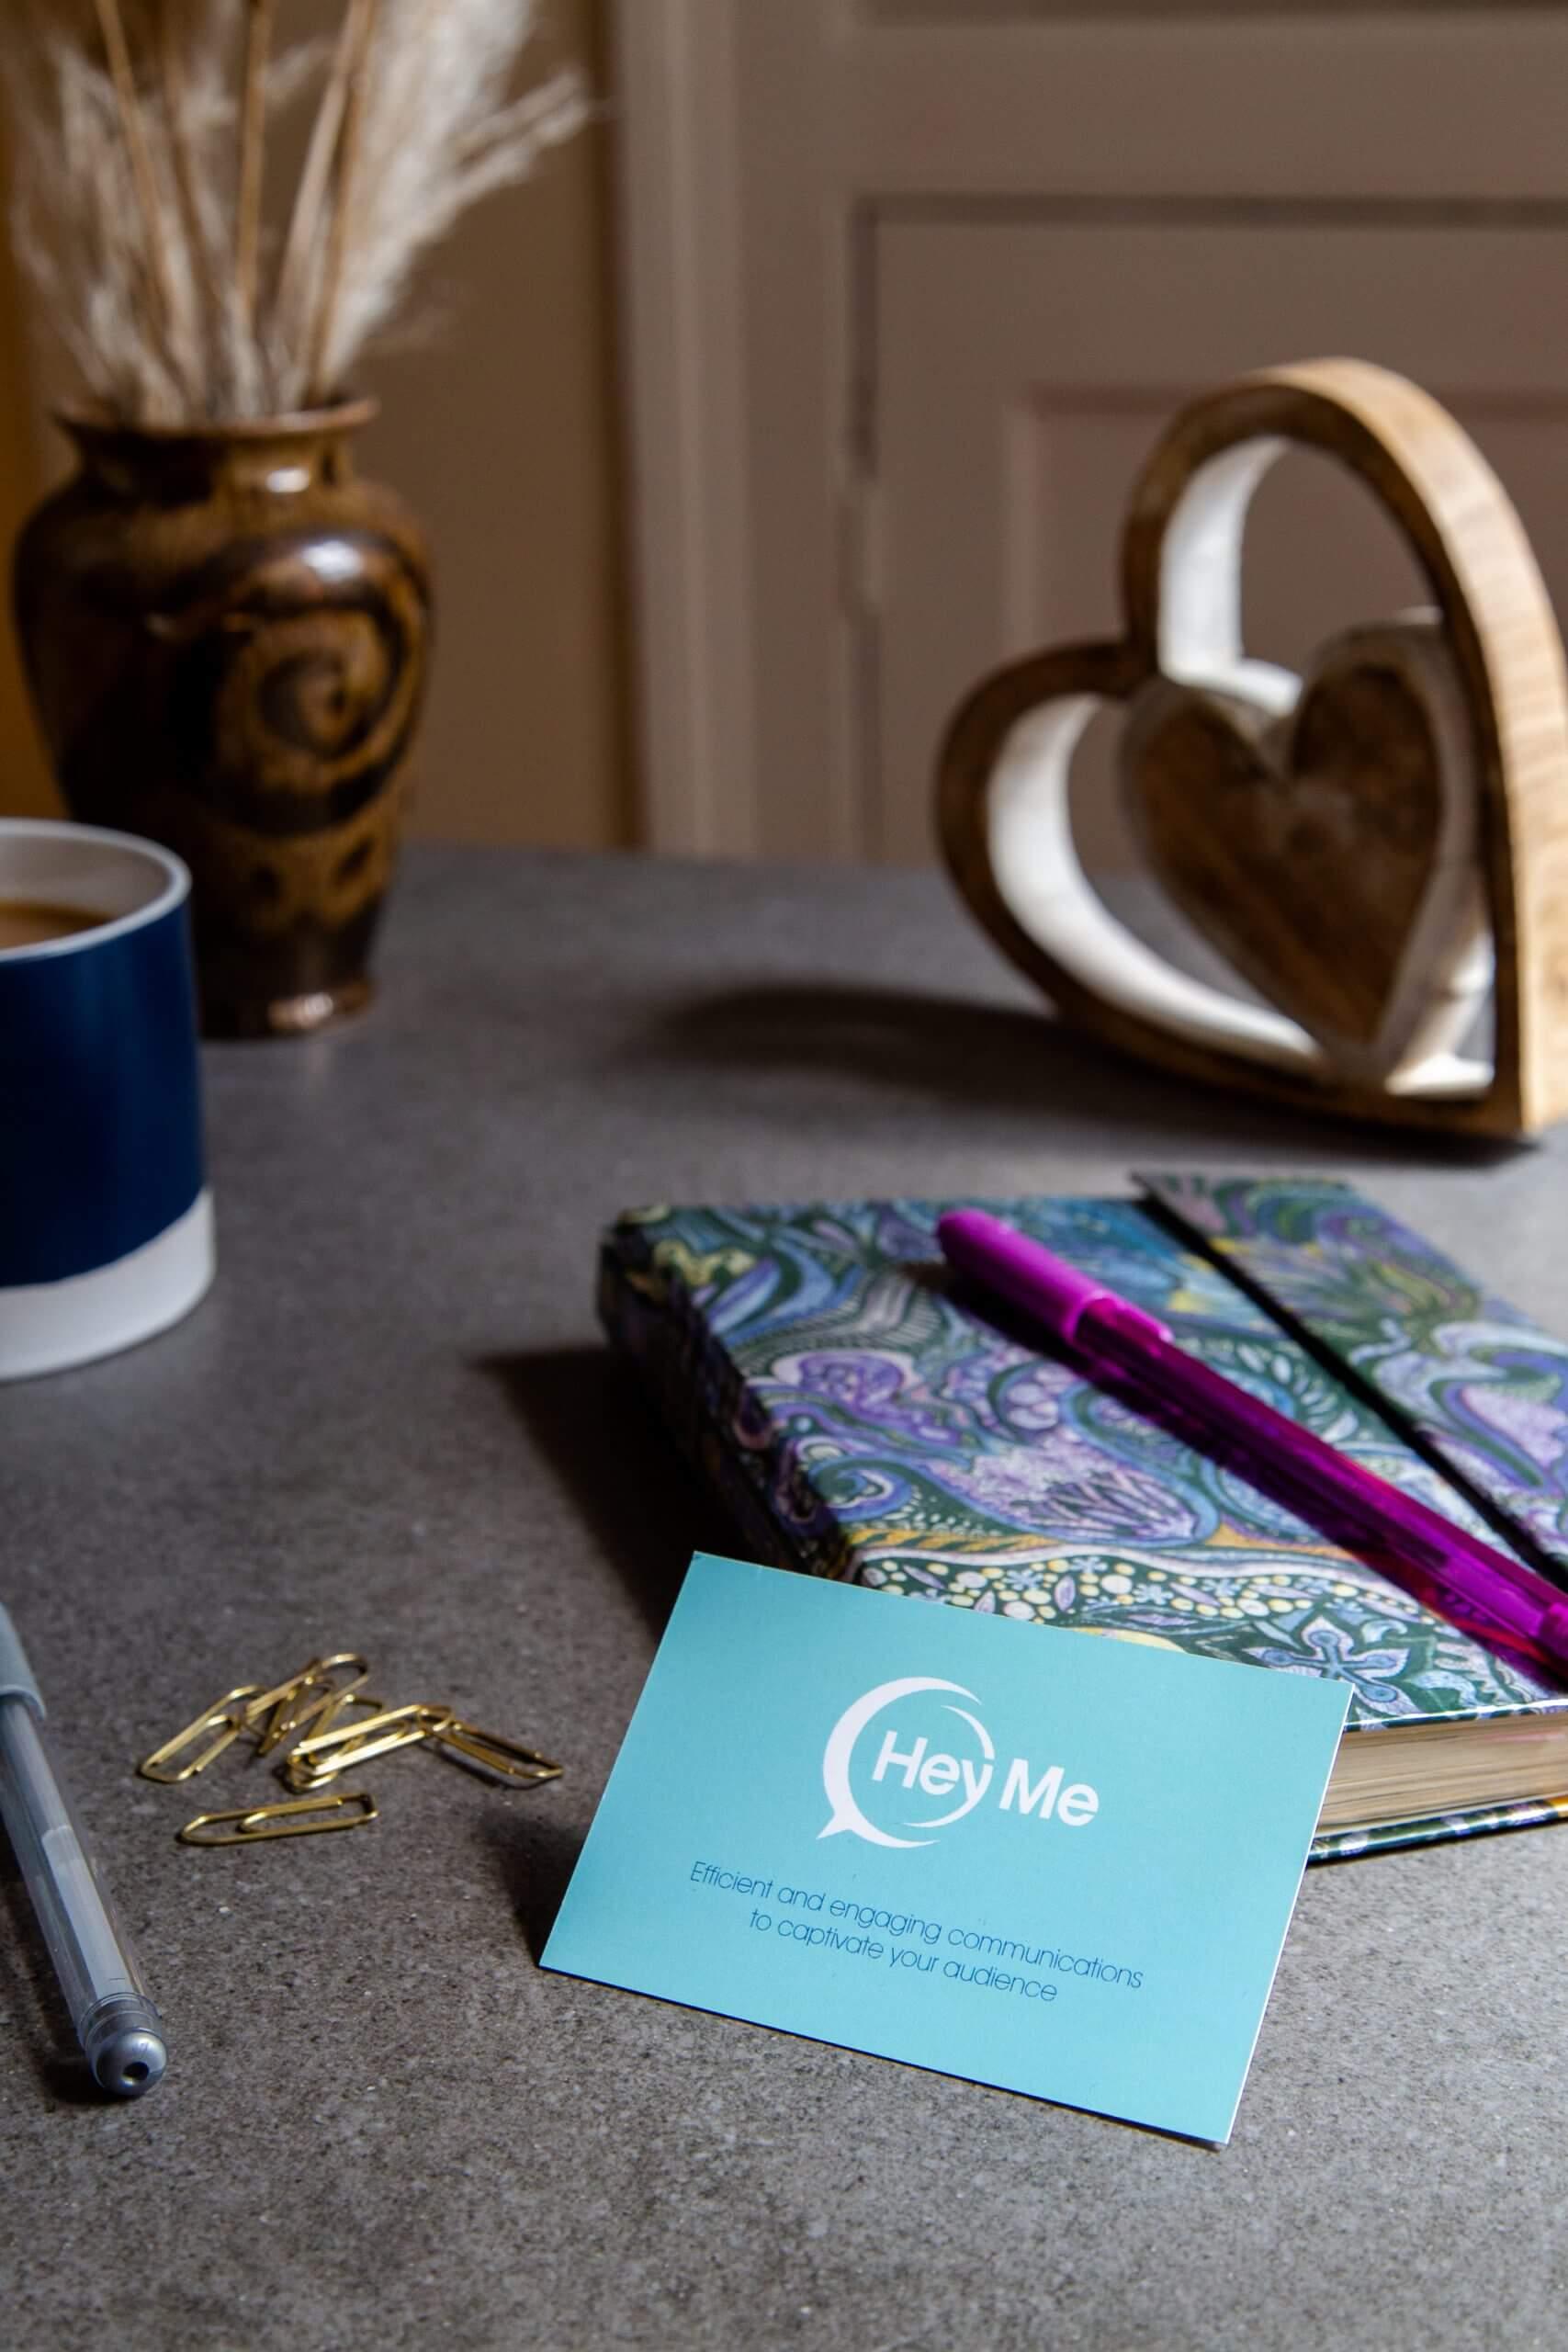 Hey Me business card, mug and notepad on a desk